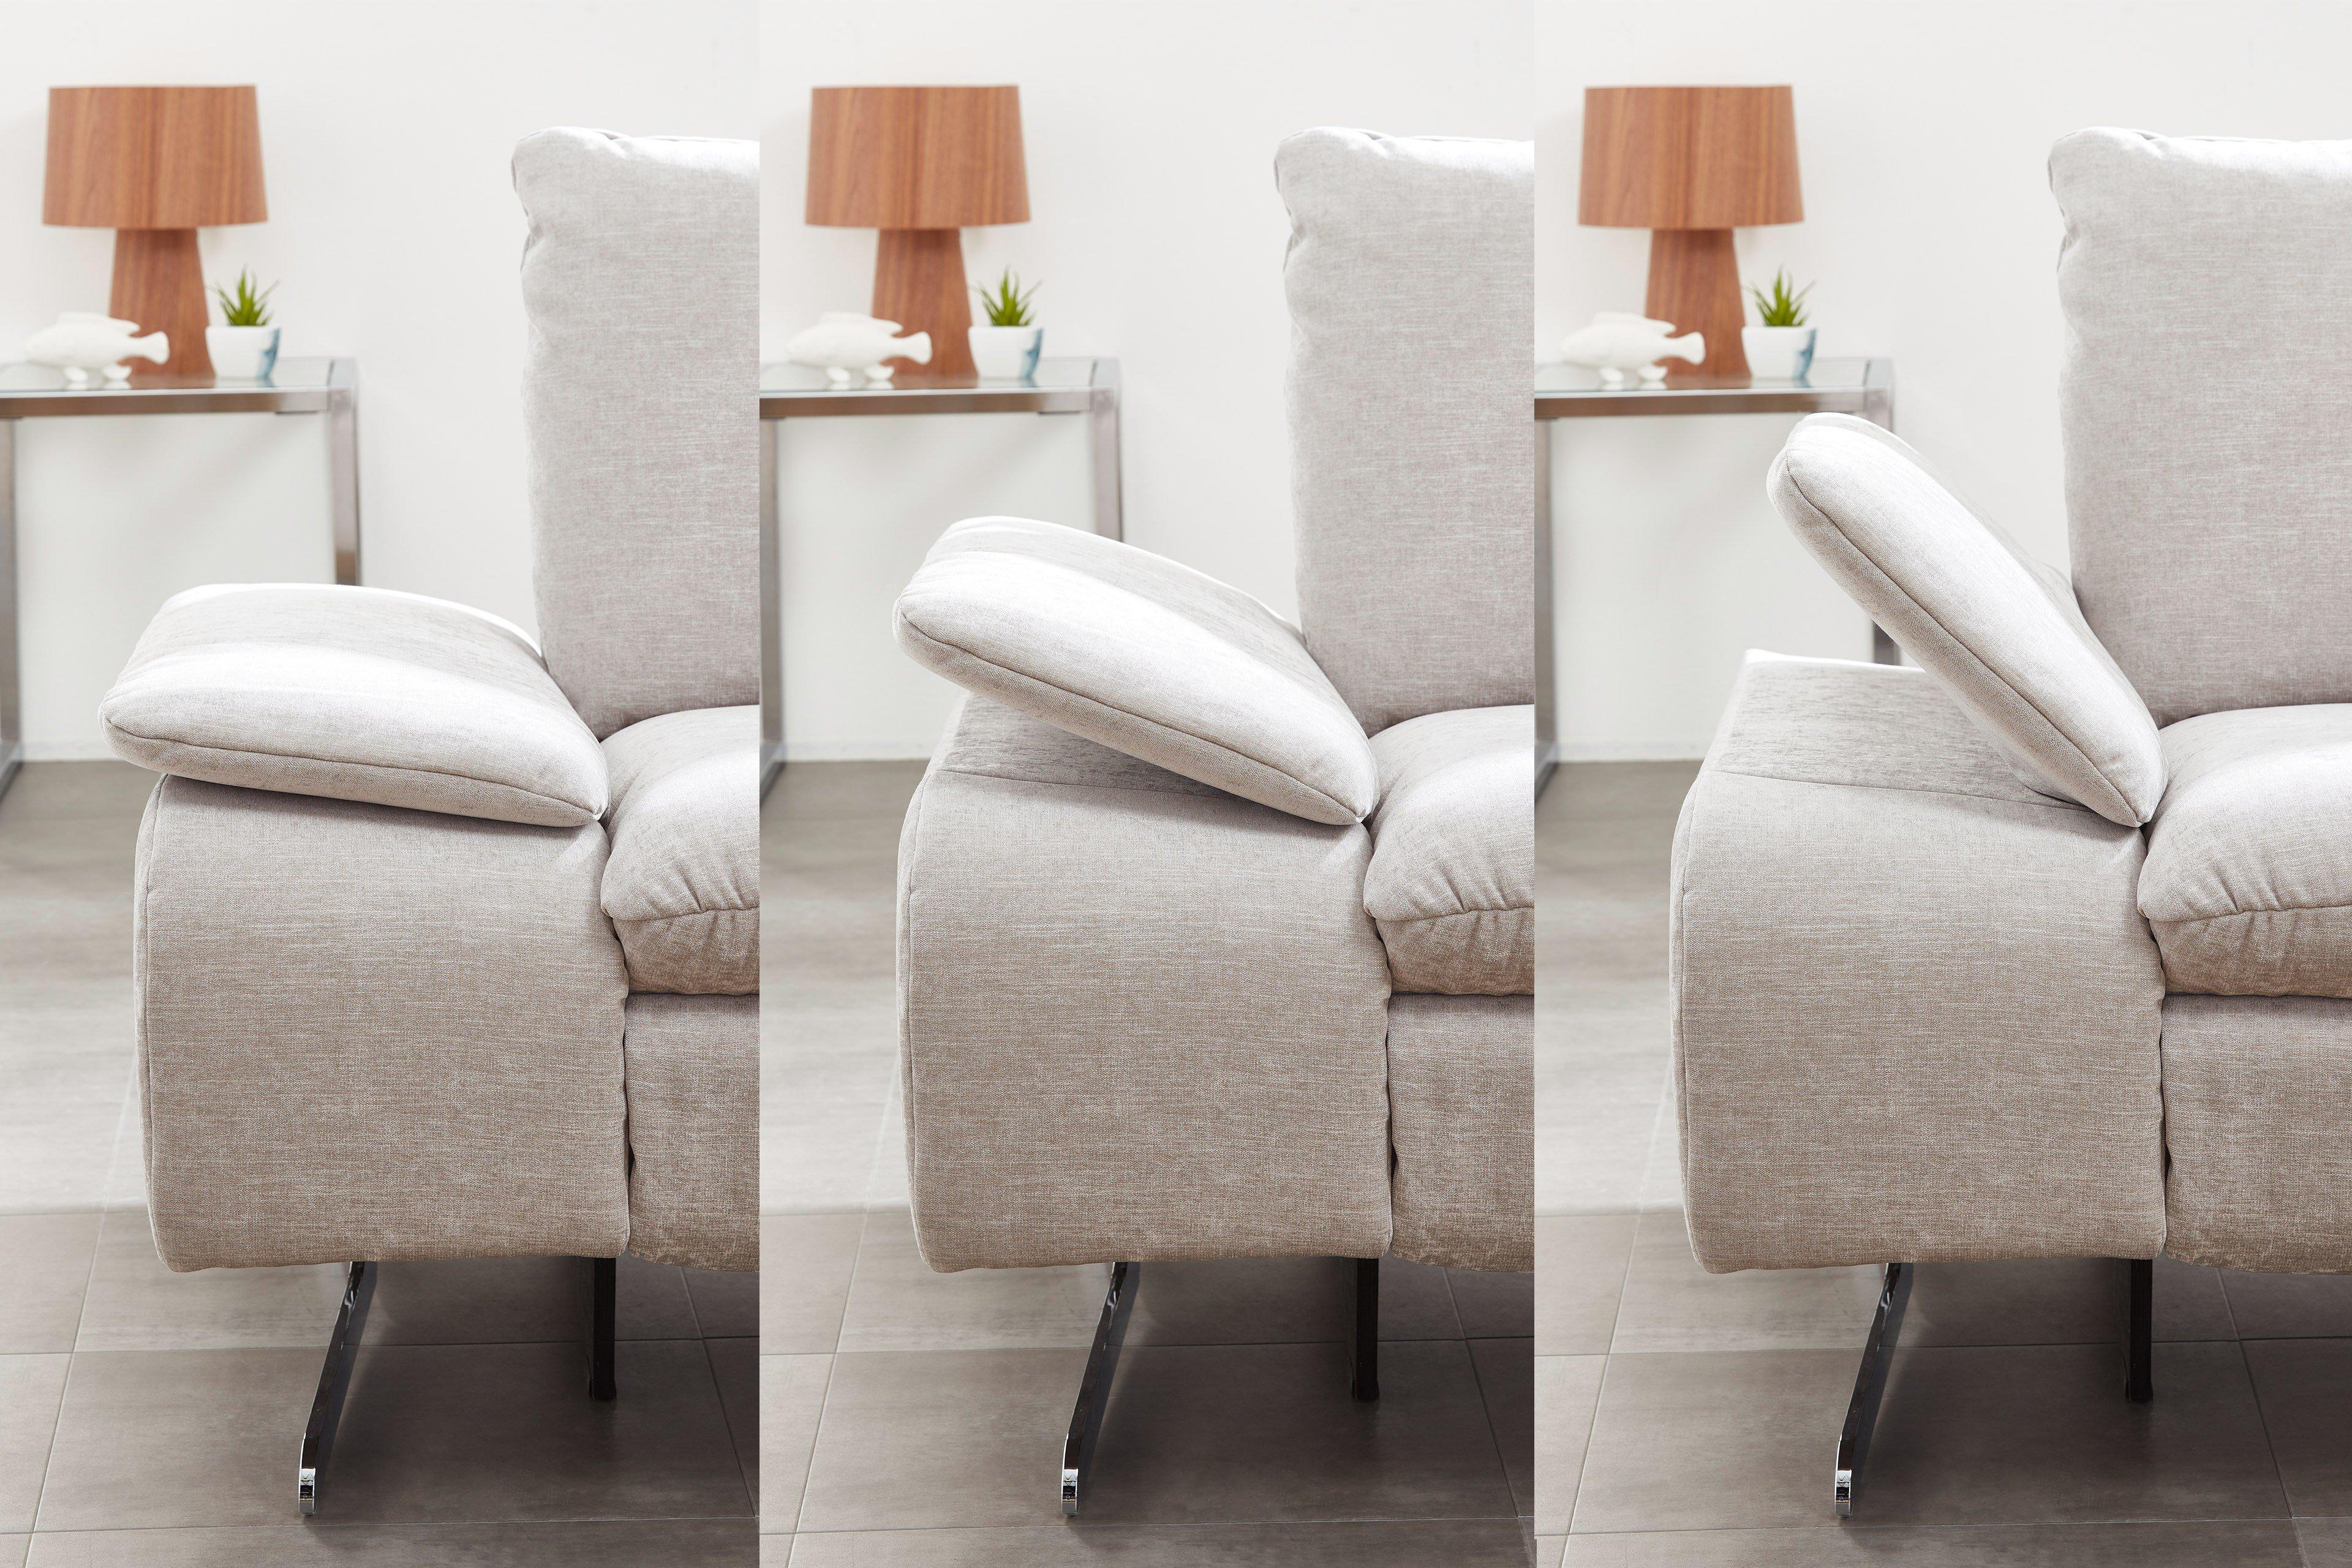 pm oelsa mexico city polsterecke in hellgrau m bel letz ihr online shop. Black Bedroom Furniture Sets. Home Design Ideas